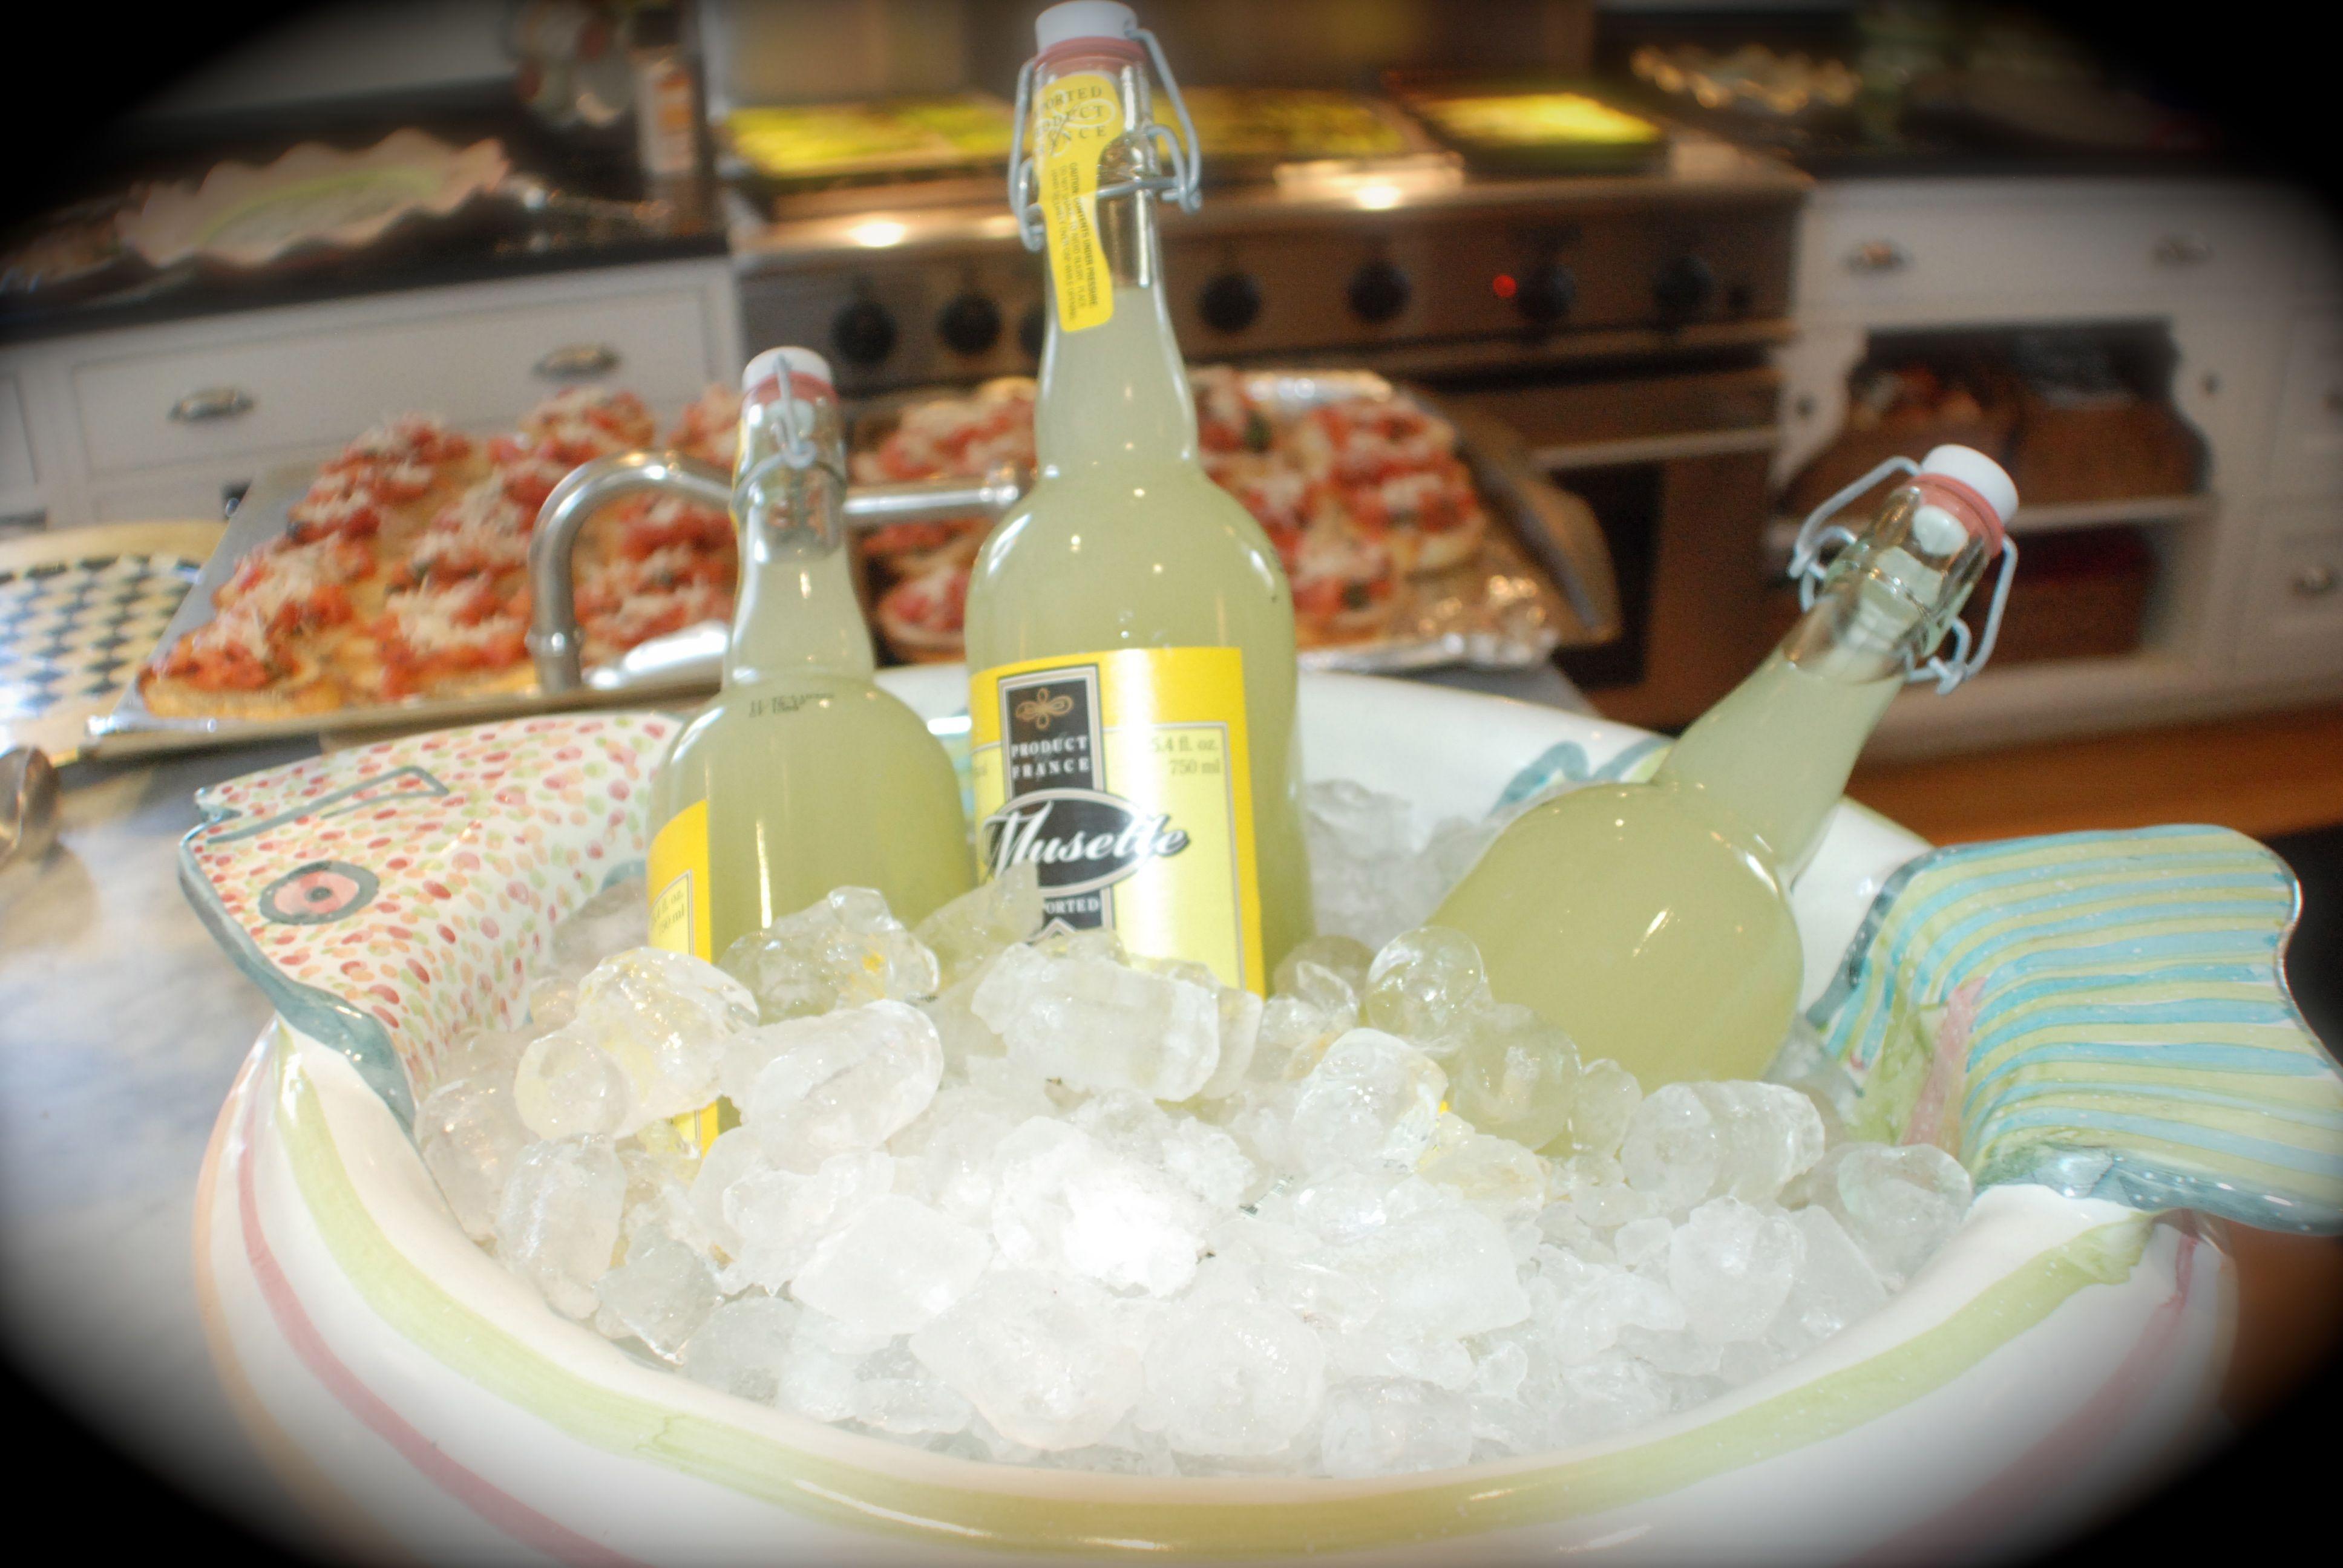 #mackenzie-childs fish bowl as ice bucket | Food, Ice ...